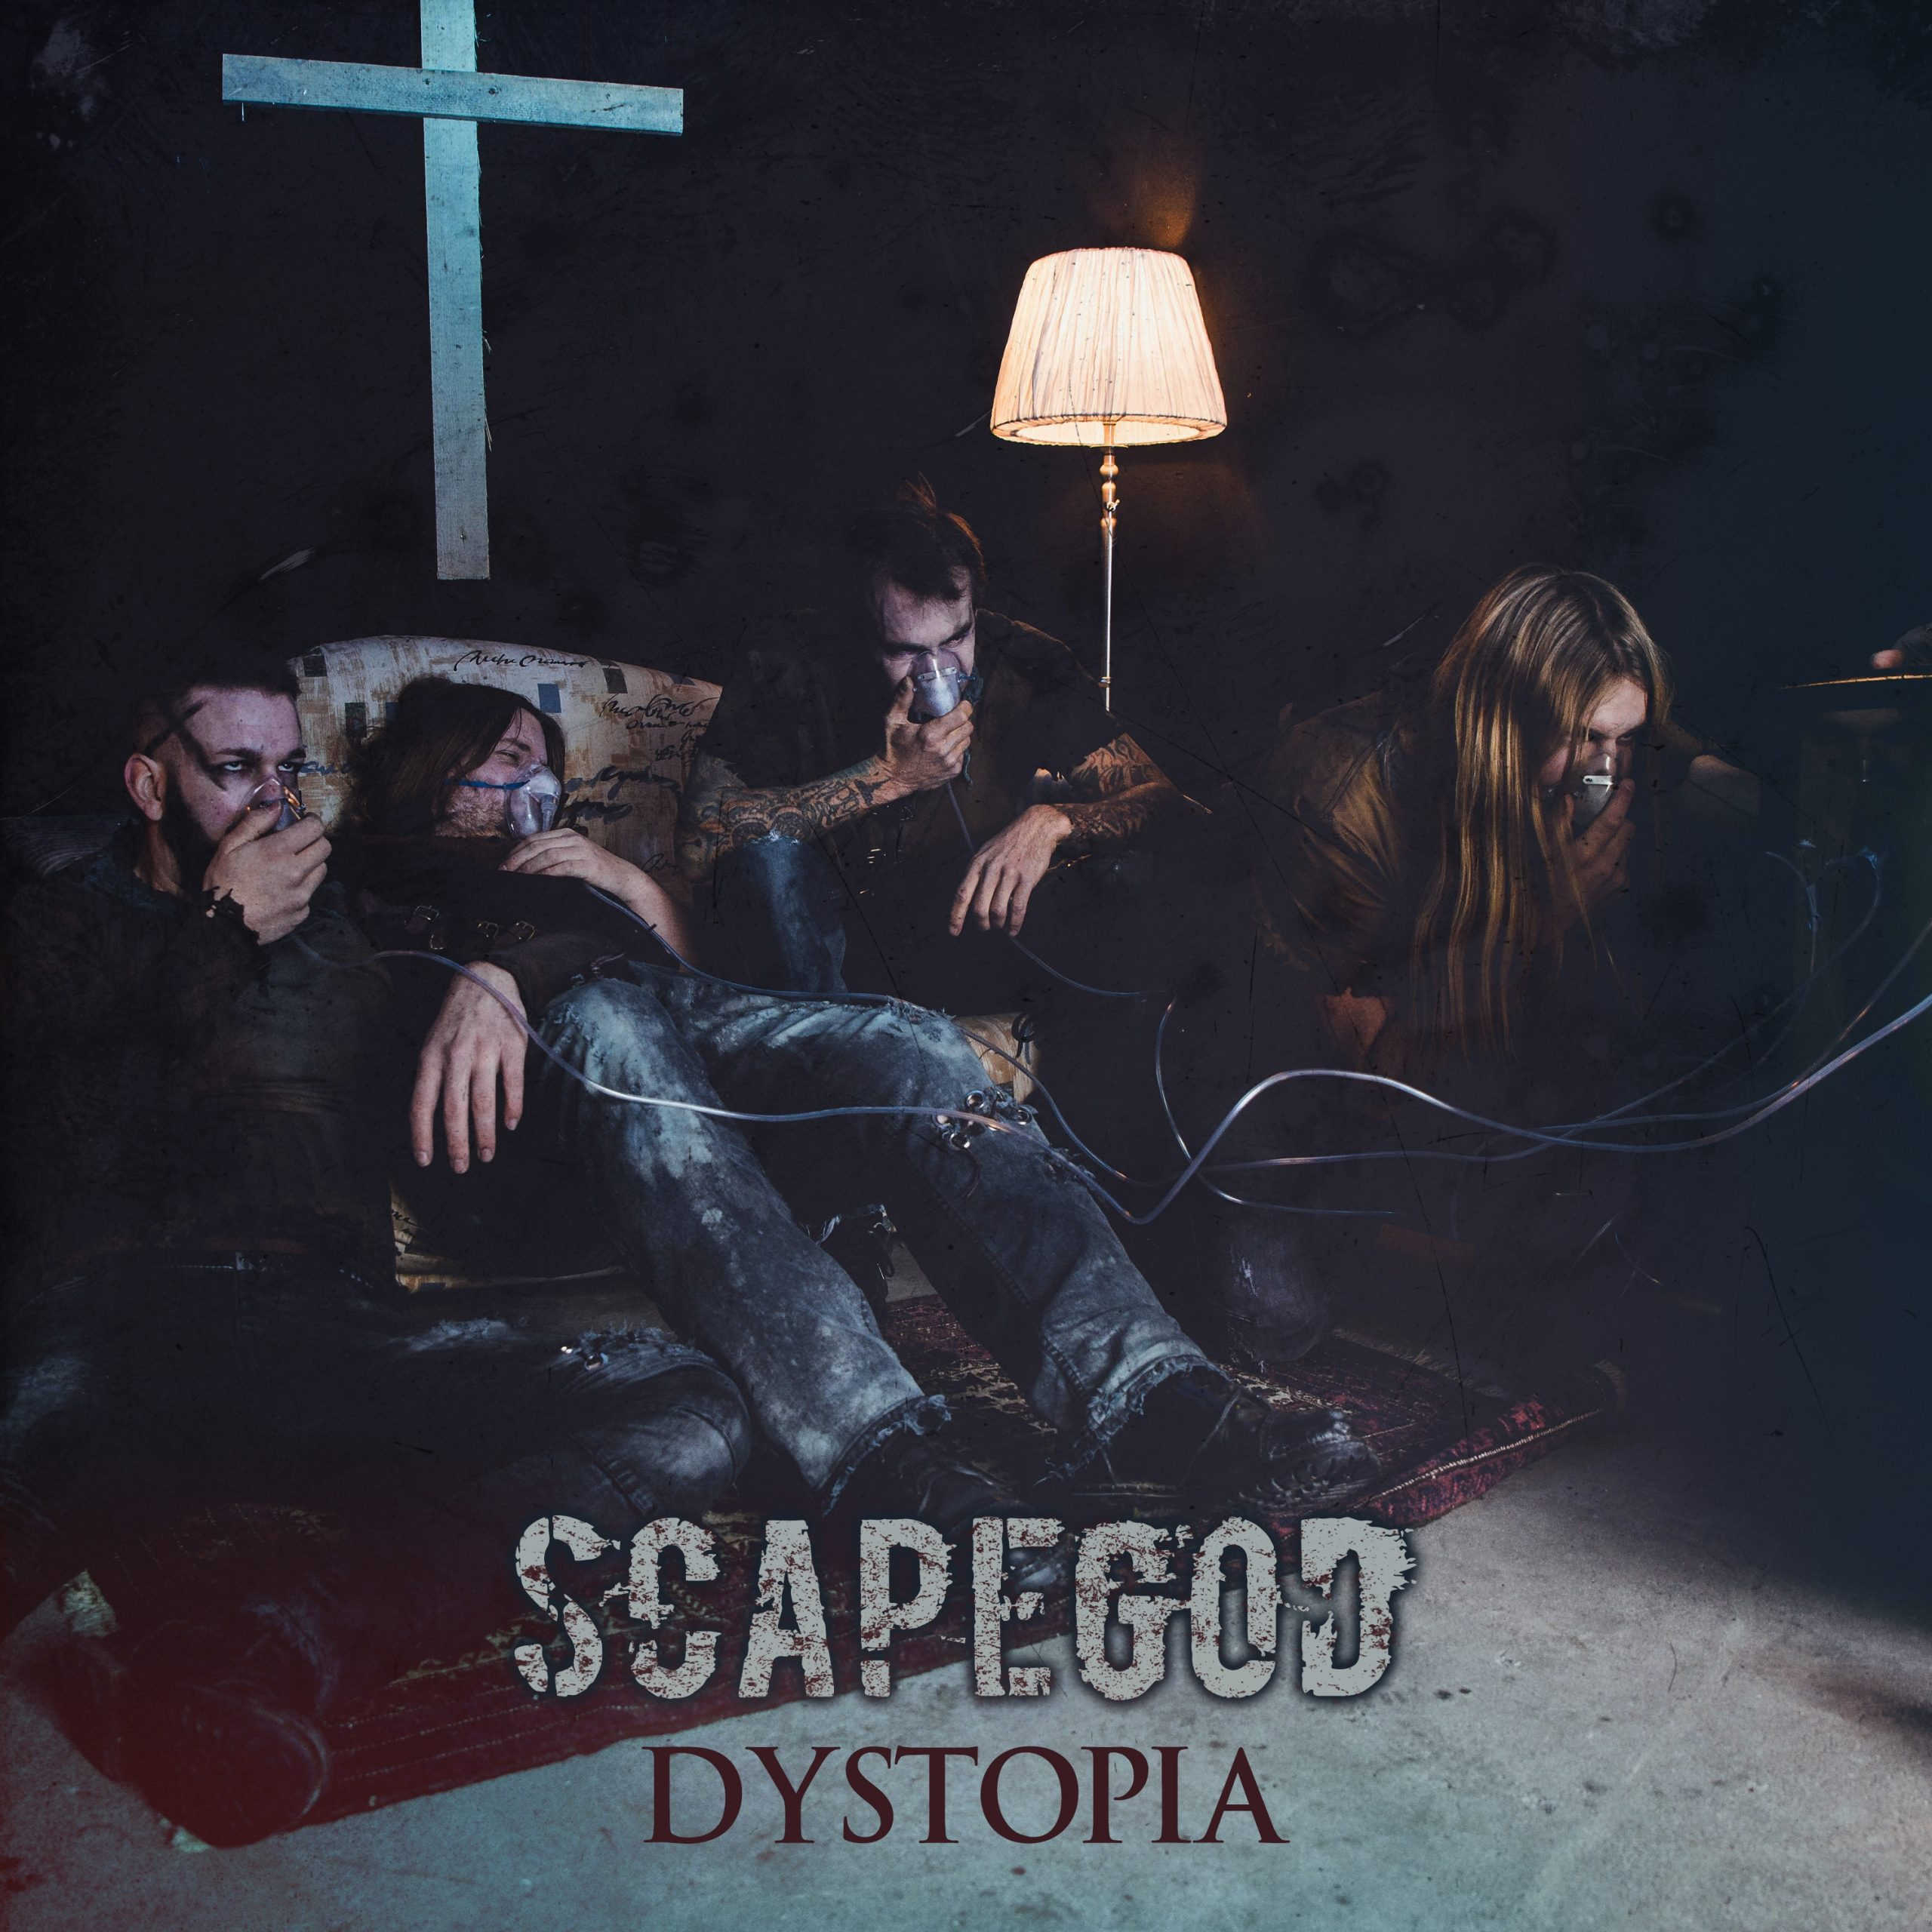 scapegod-dystopia-ein-album-review